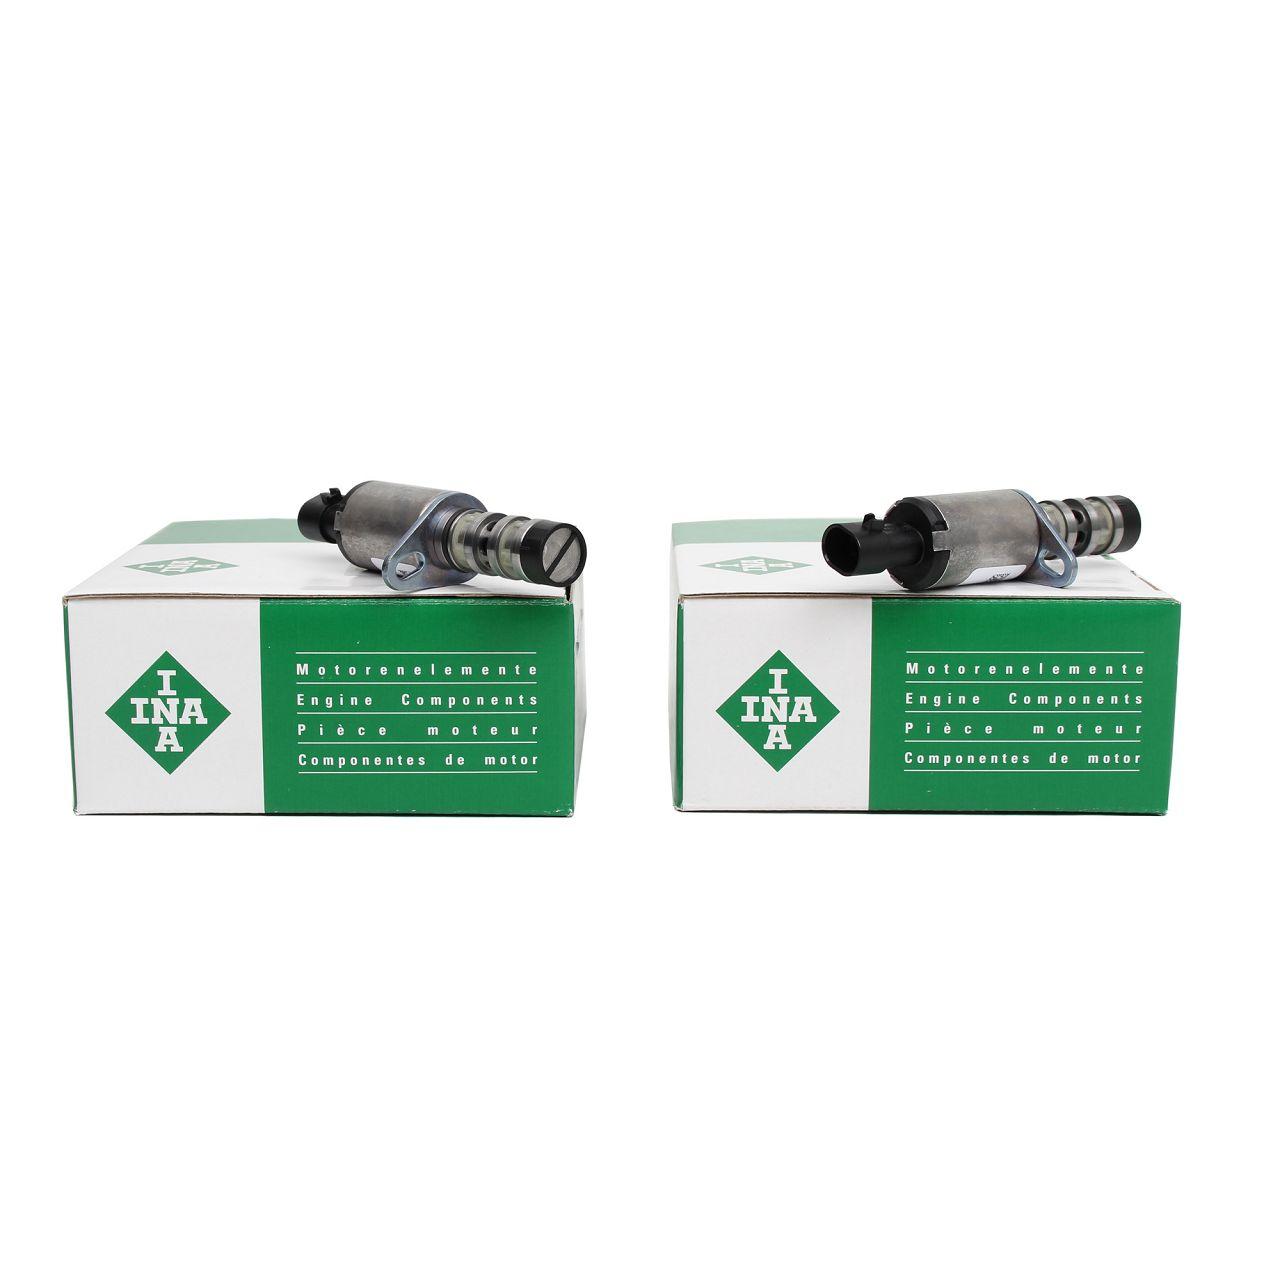 2x INA Nockenwellenversteller Steuerventil OPEL Astra H J Insignia A 1235299